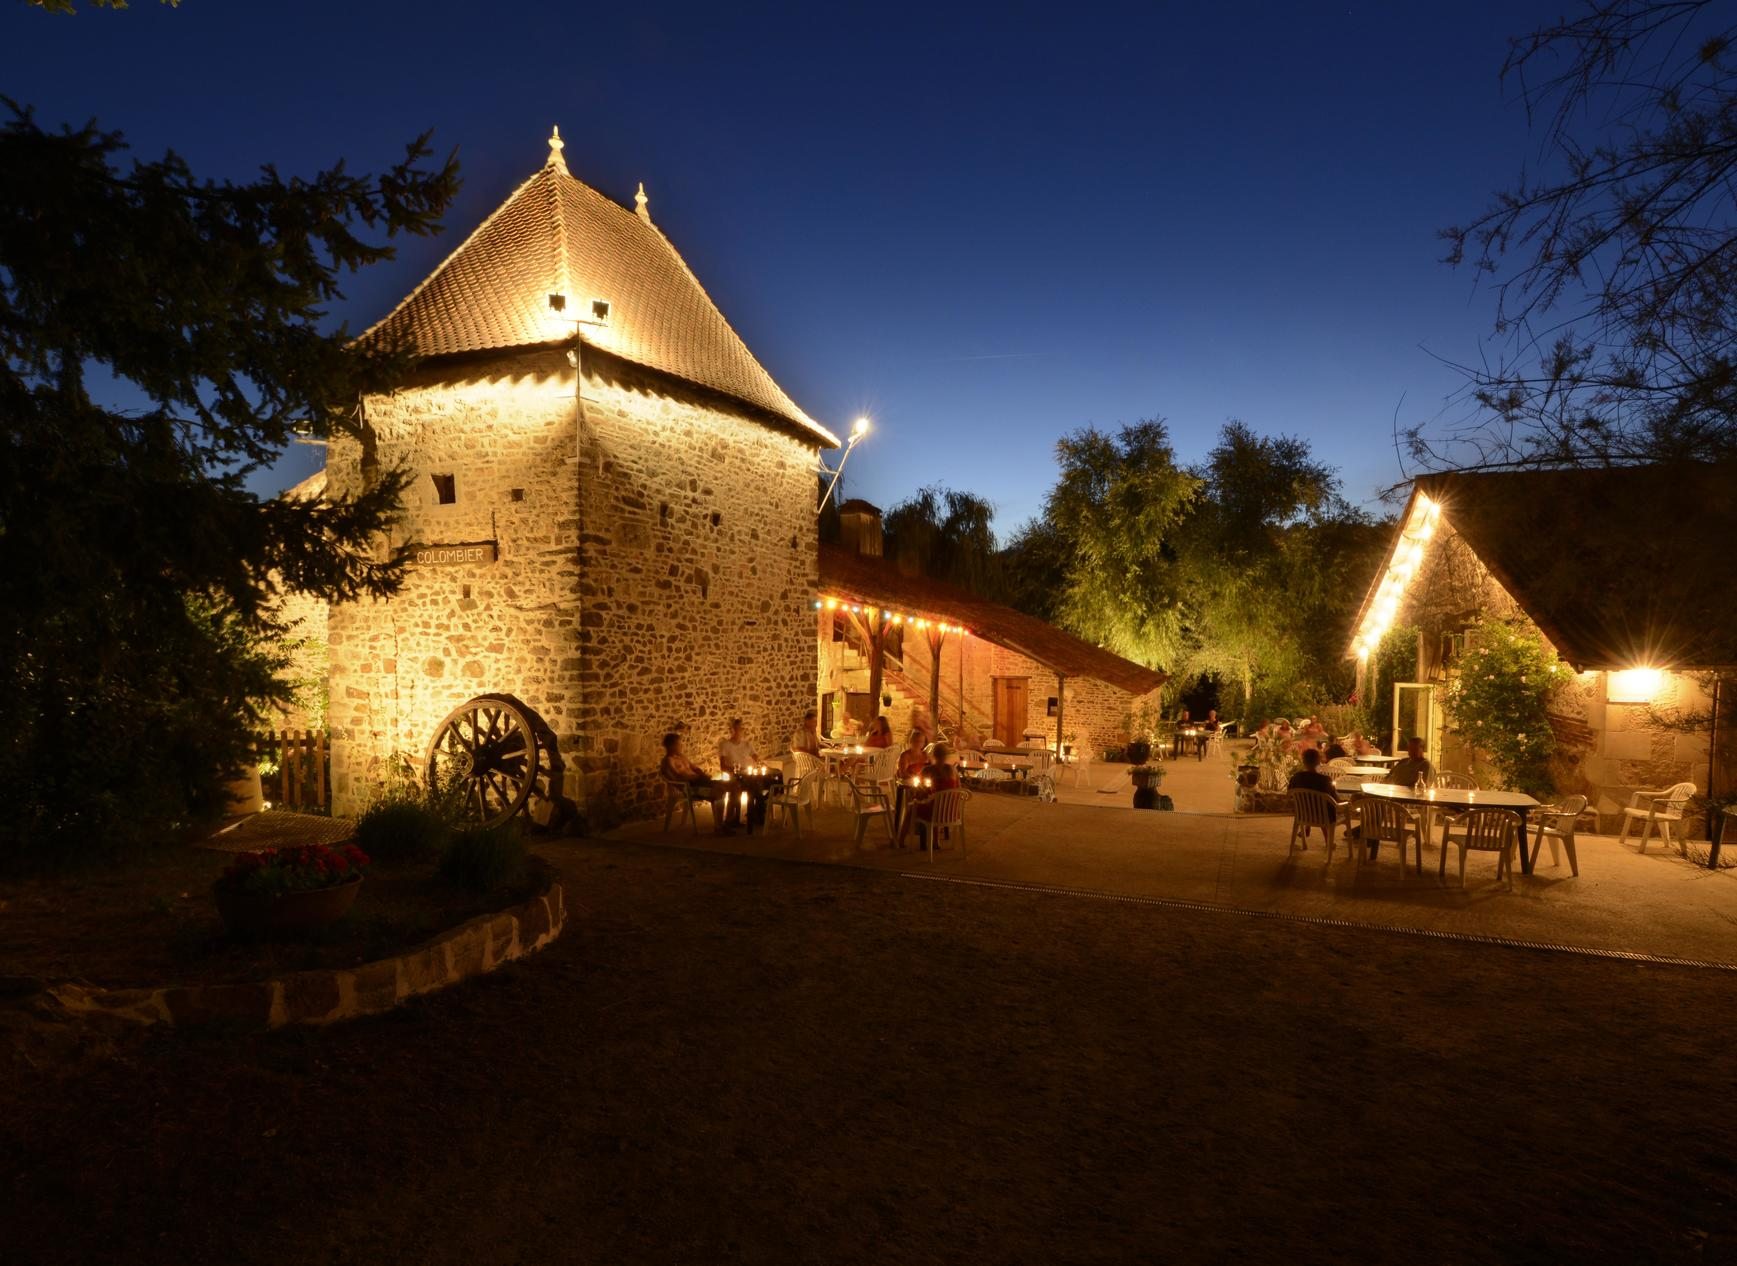 Frankrijk-SaintMartinLarsenSainteHermine-Camping%20Le%20Colombier-ExtraLarge Campings Frankrijk